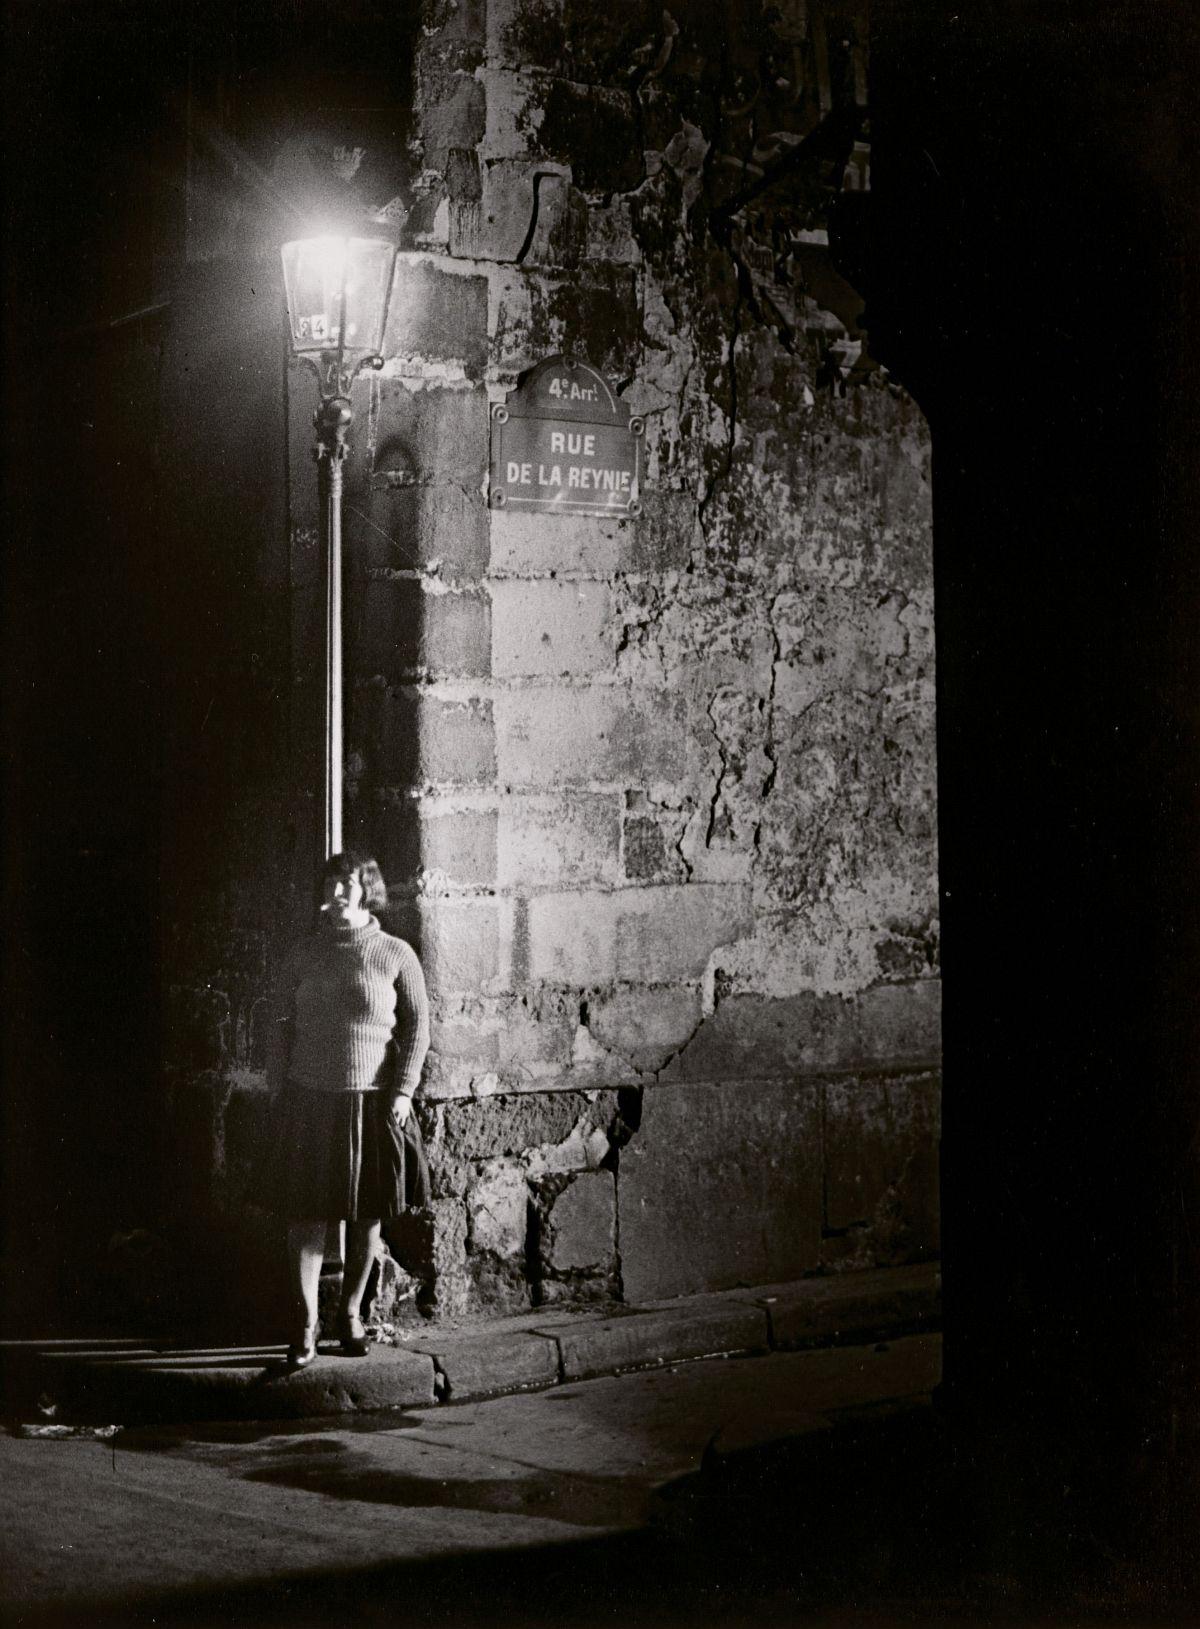 Brassaï, Fille des Halles, Pres de Sebastopol, c. 1932